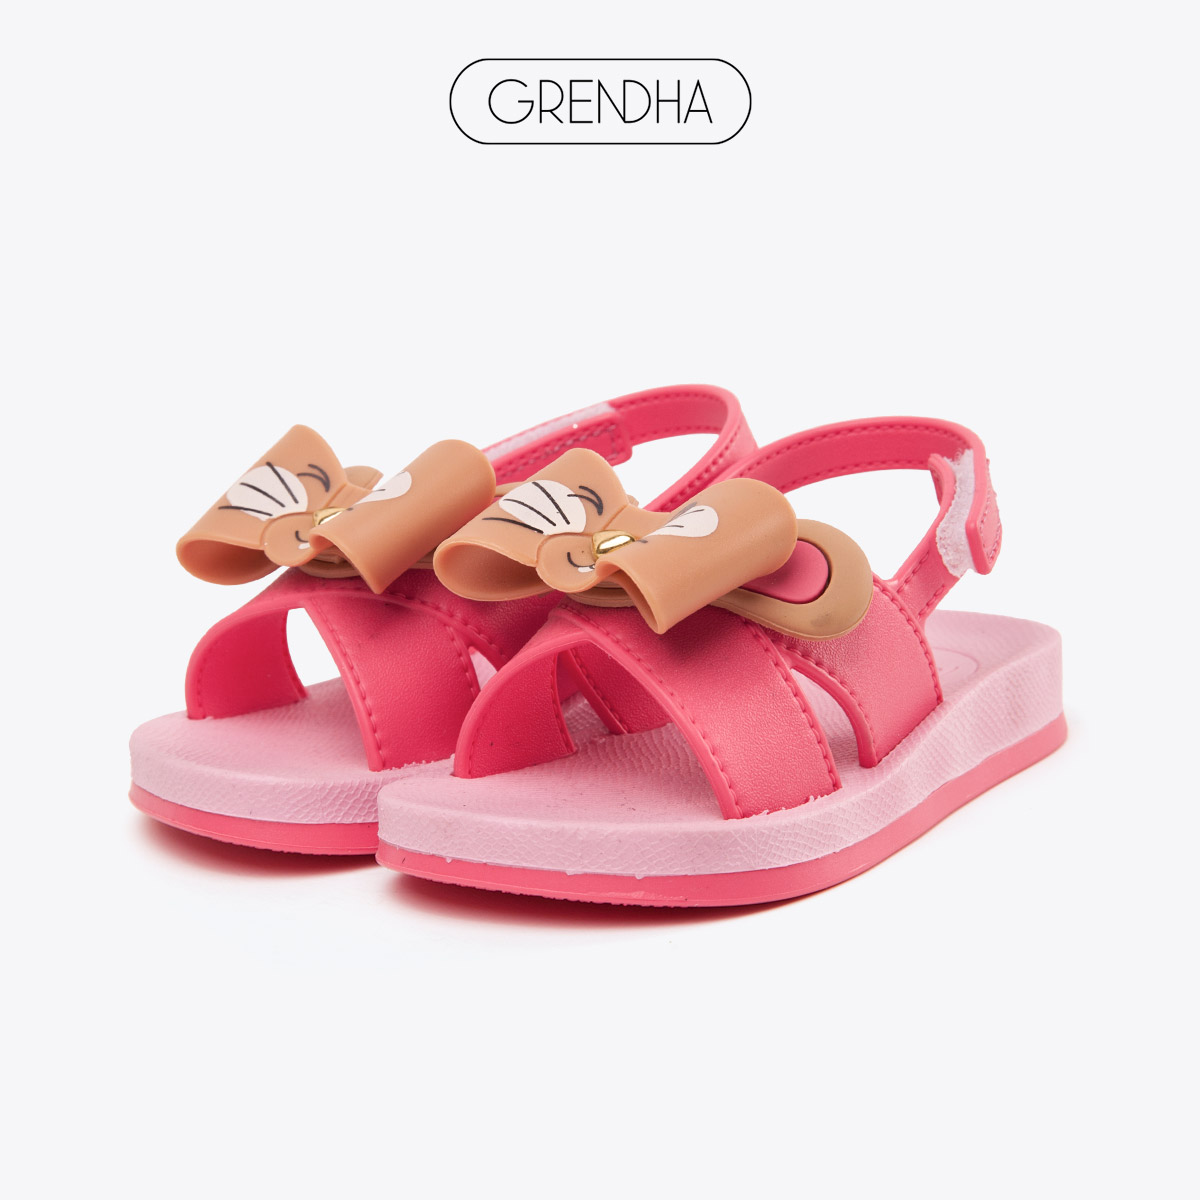 grendha儿童凉鞋夏季新款巴西进口舒适可爱小童软底防滑女童鞋子